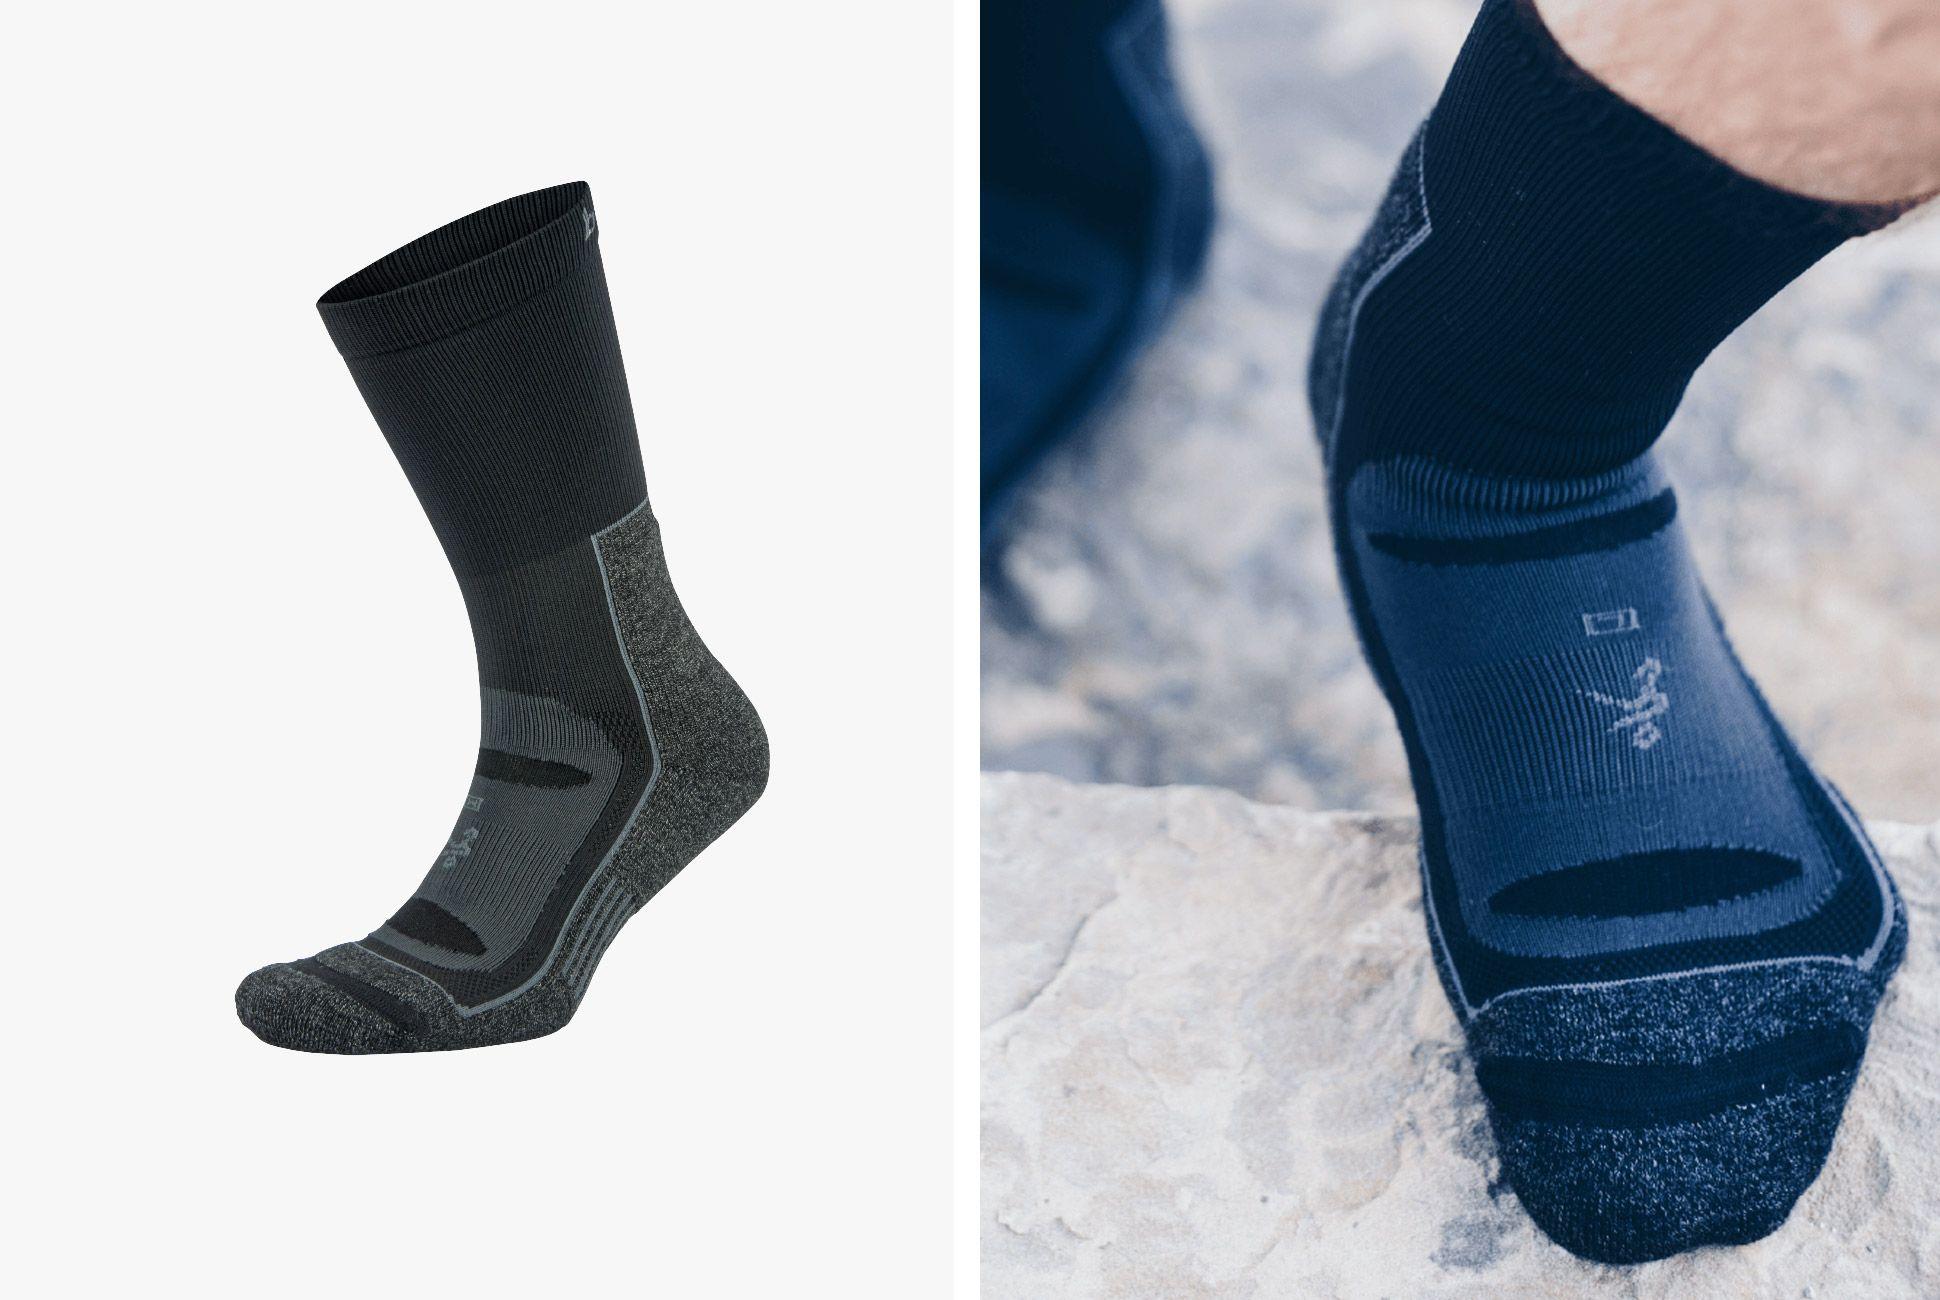 Balega's Blister Resistant Socks Have a